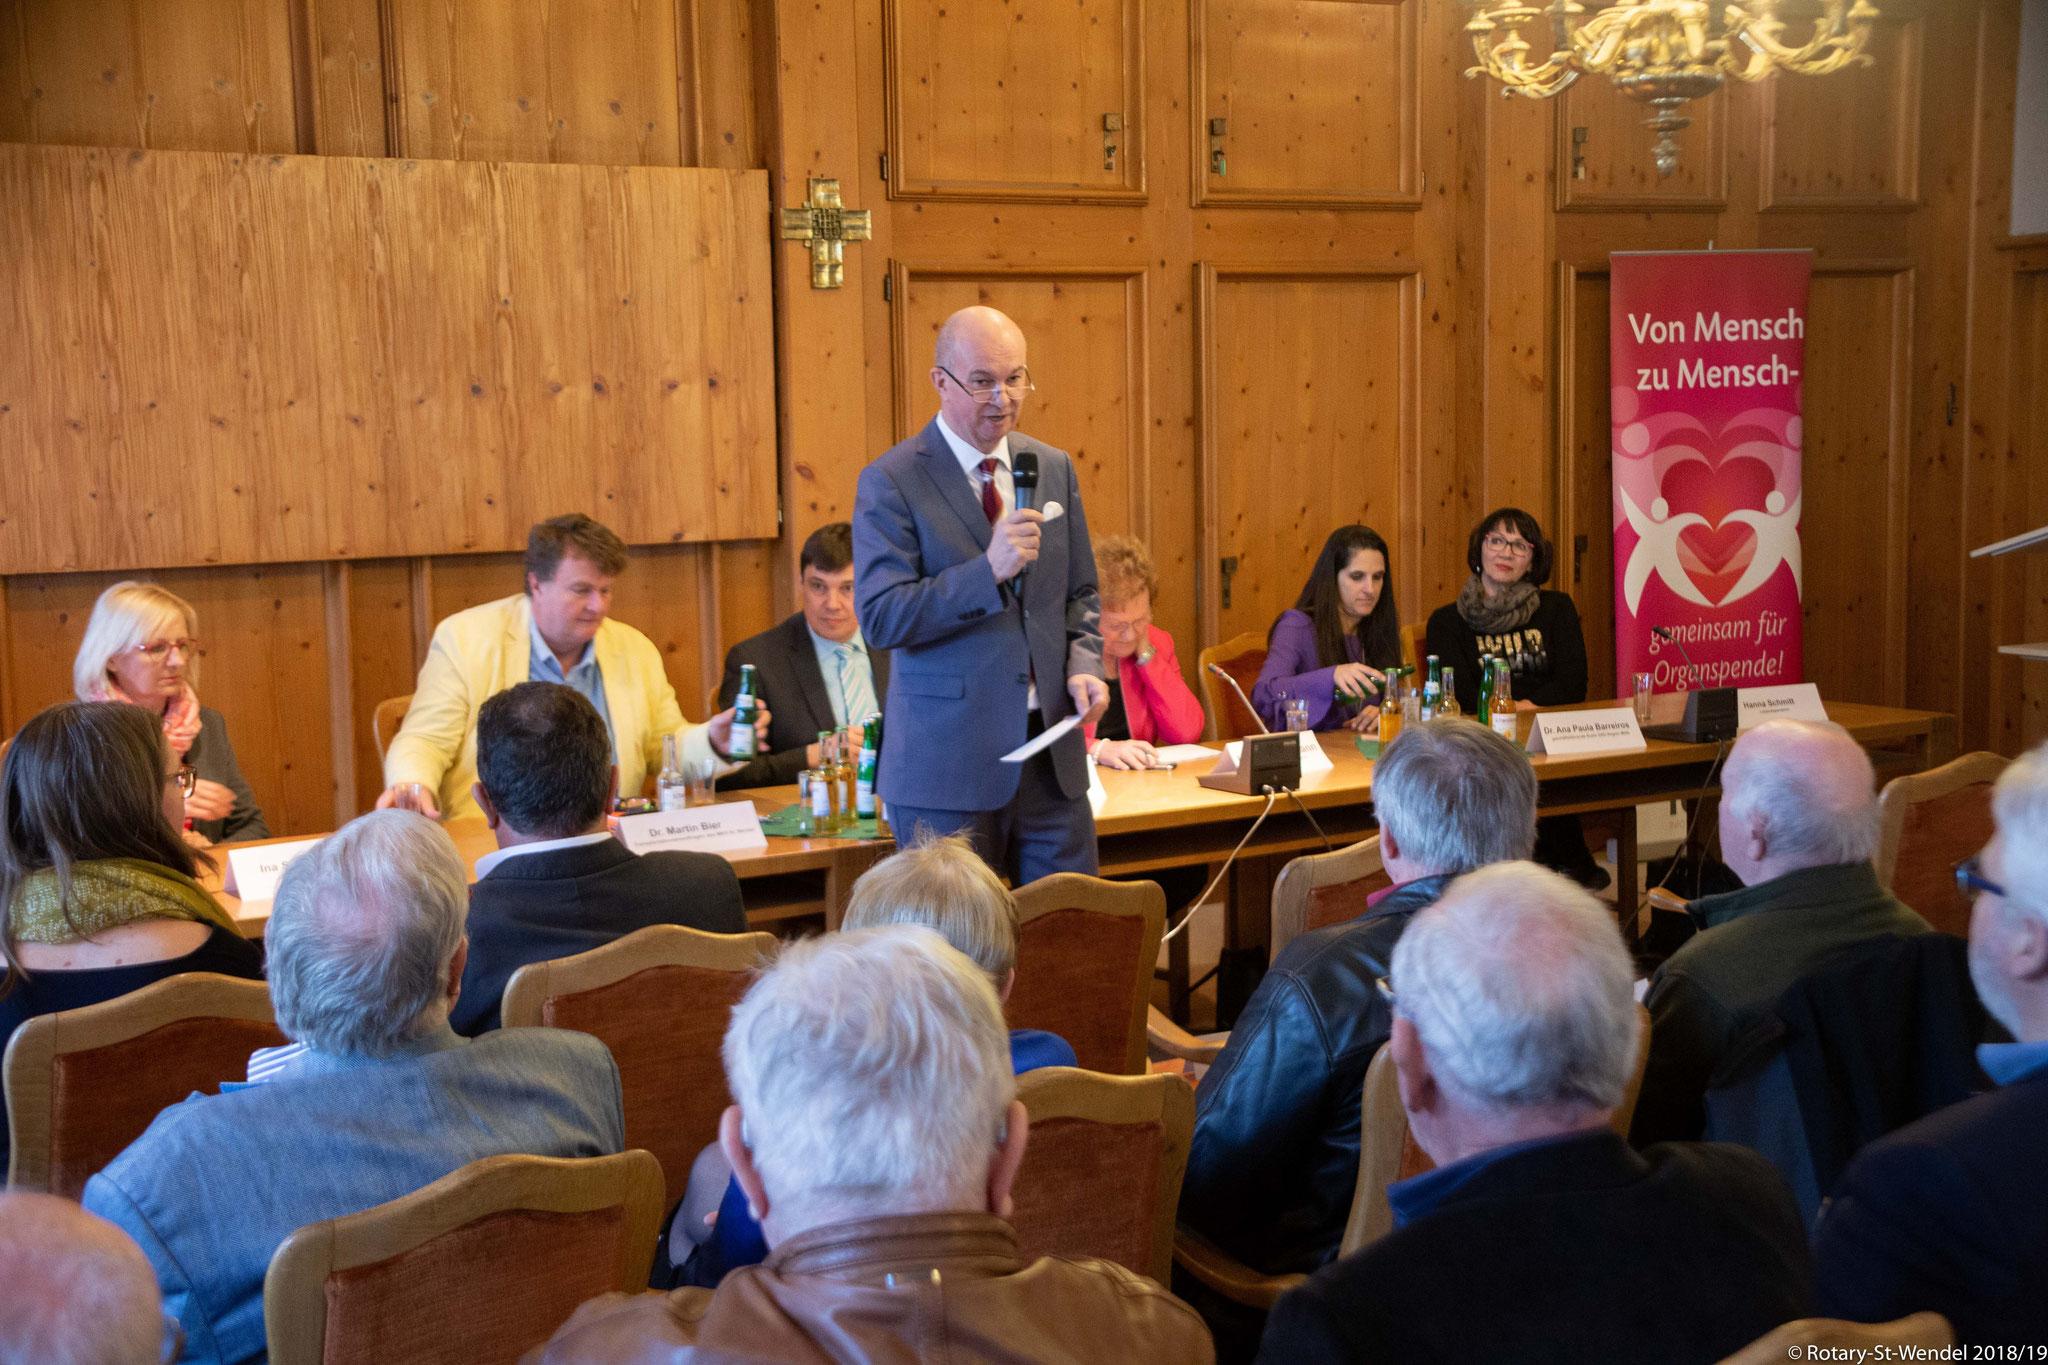 Wolfgang Jung, Präsident des Rotary Club St. Wendel, begrüsst die Gäste